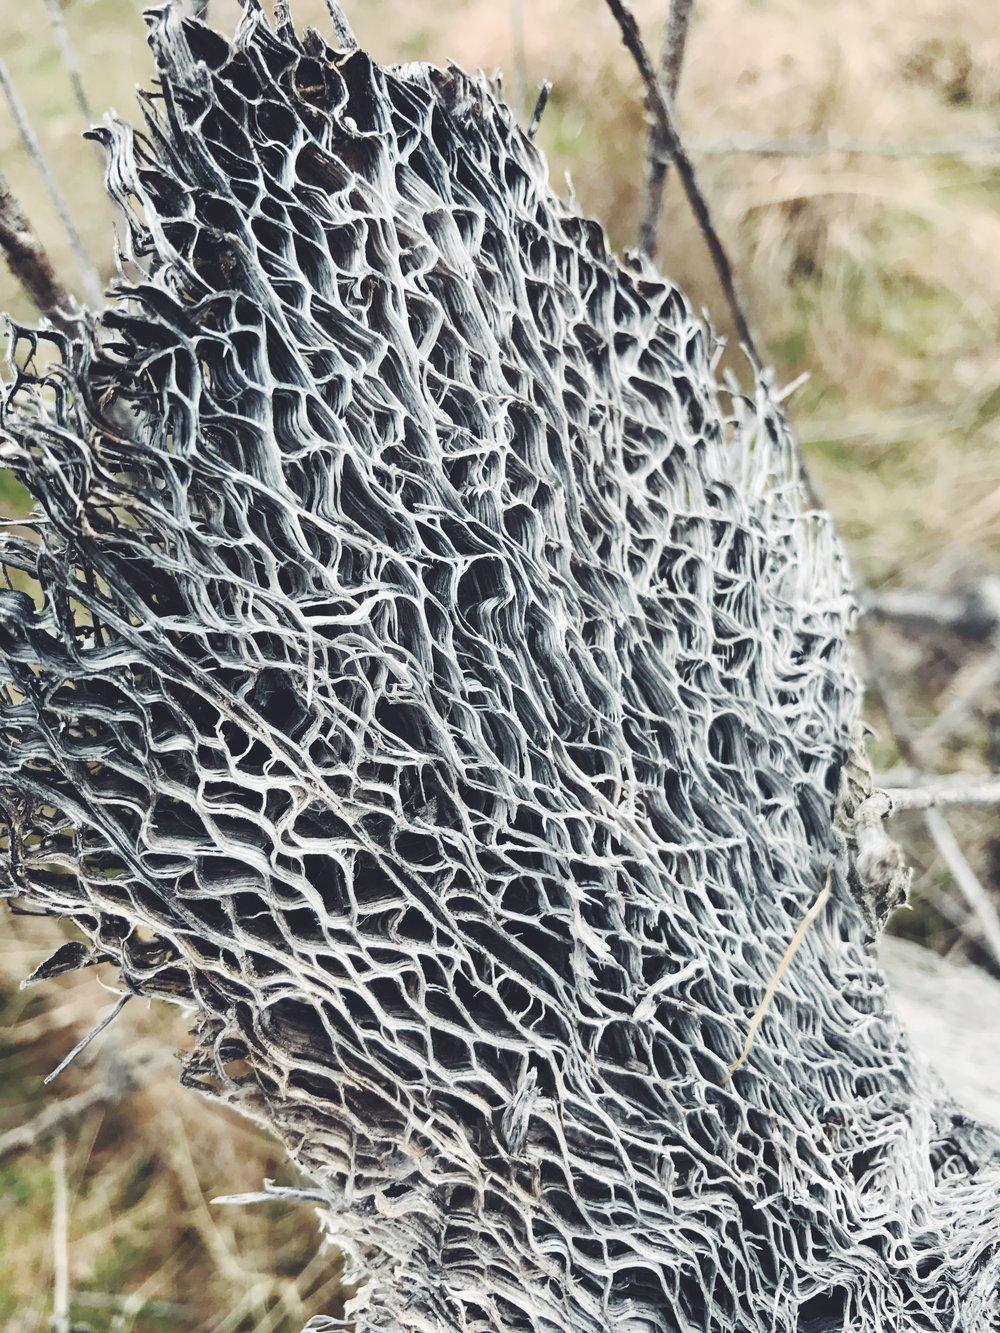 Opuntia sp., Prickly Pear Cactus skeleton